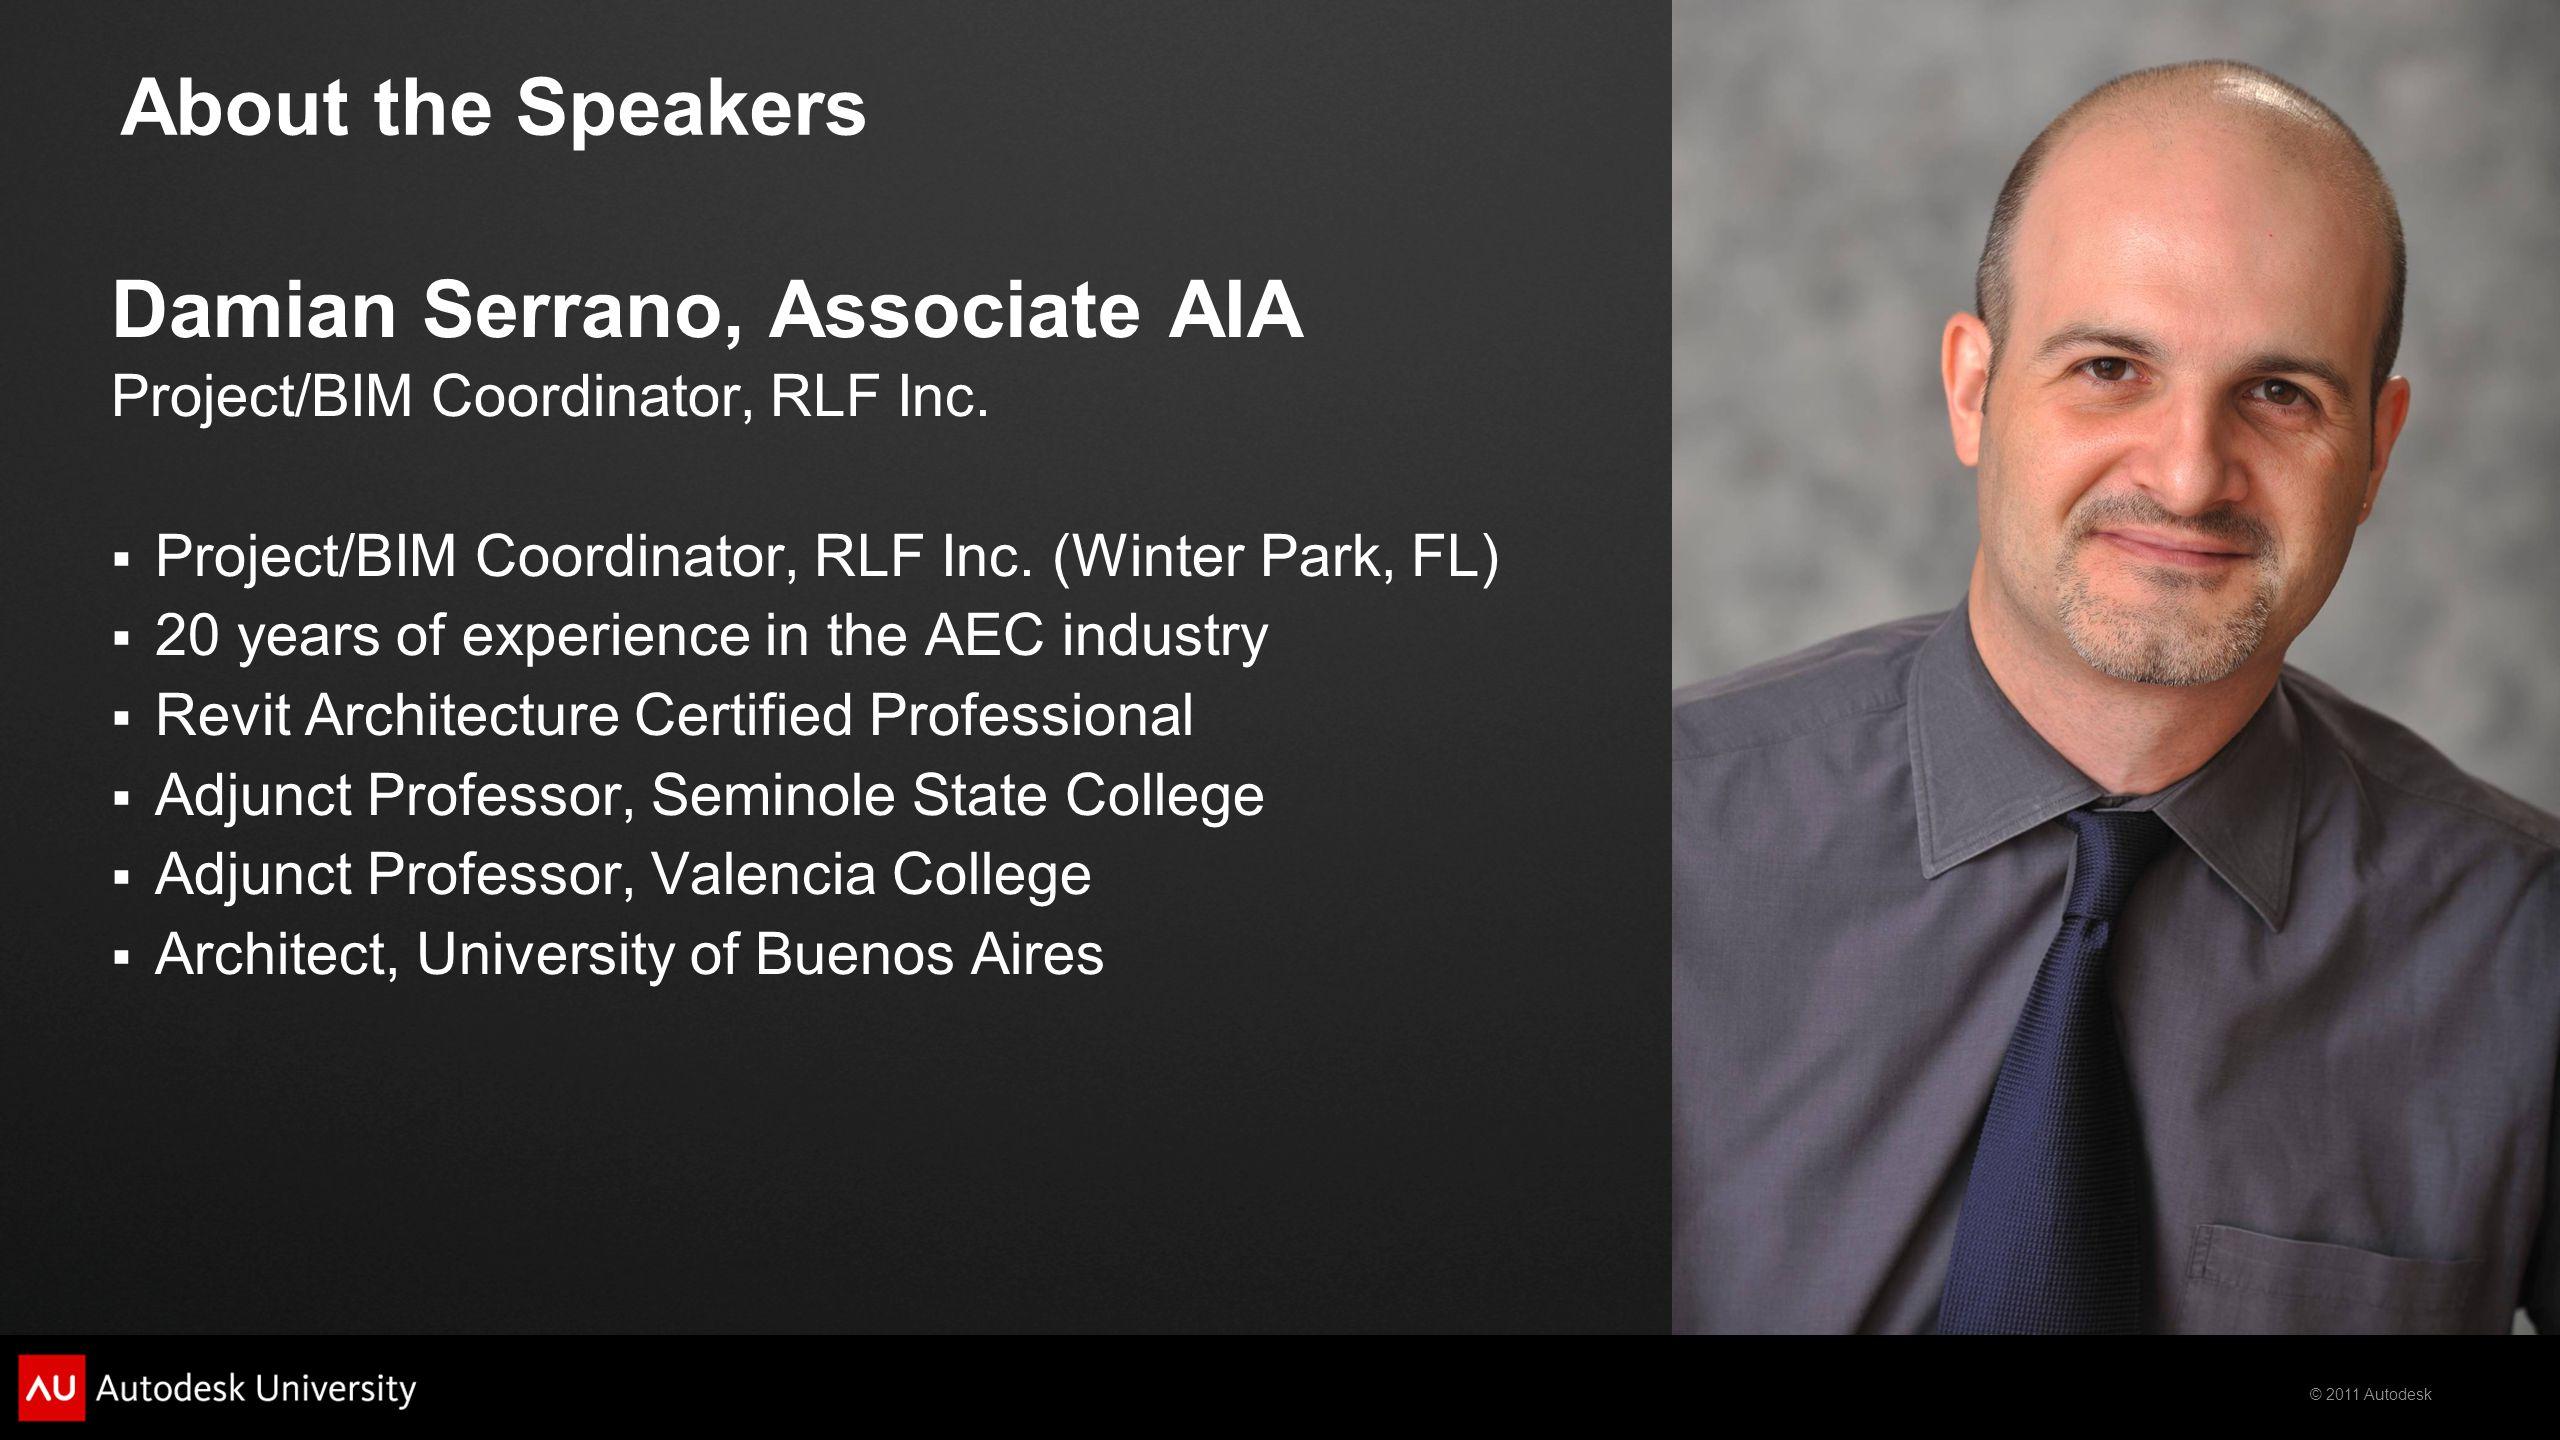 Damian Serrano, Associate AIA